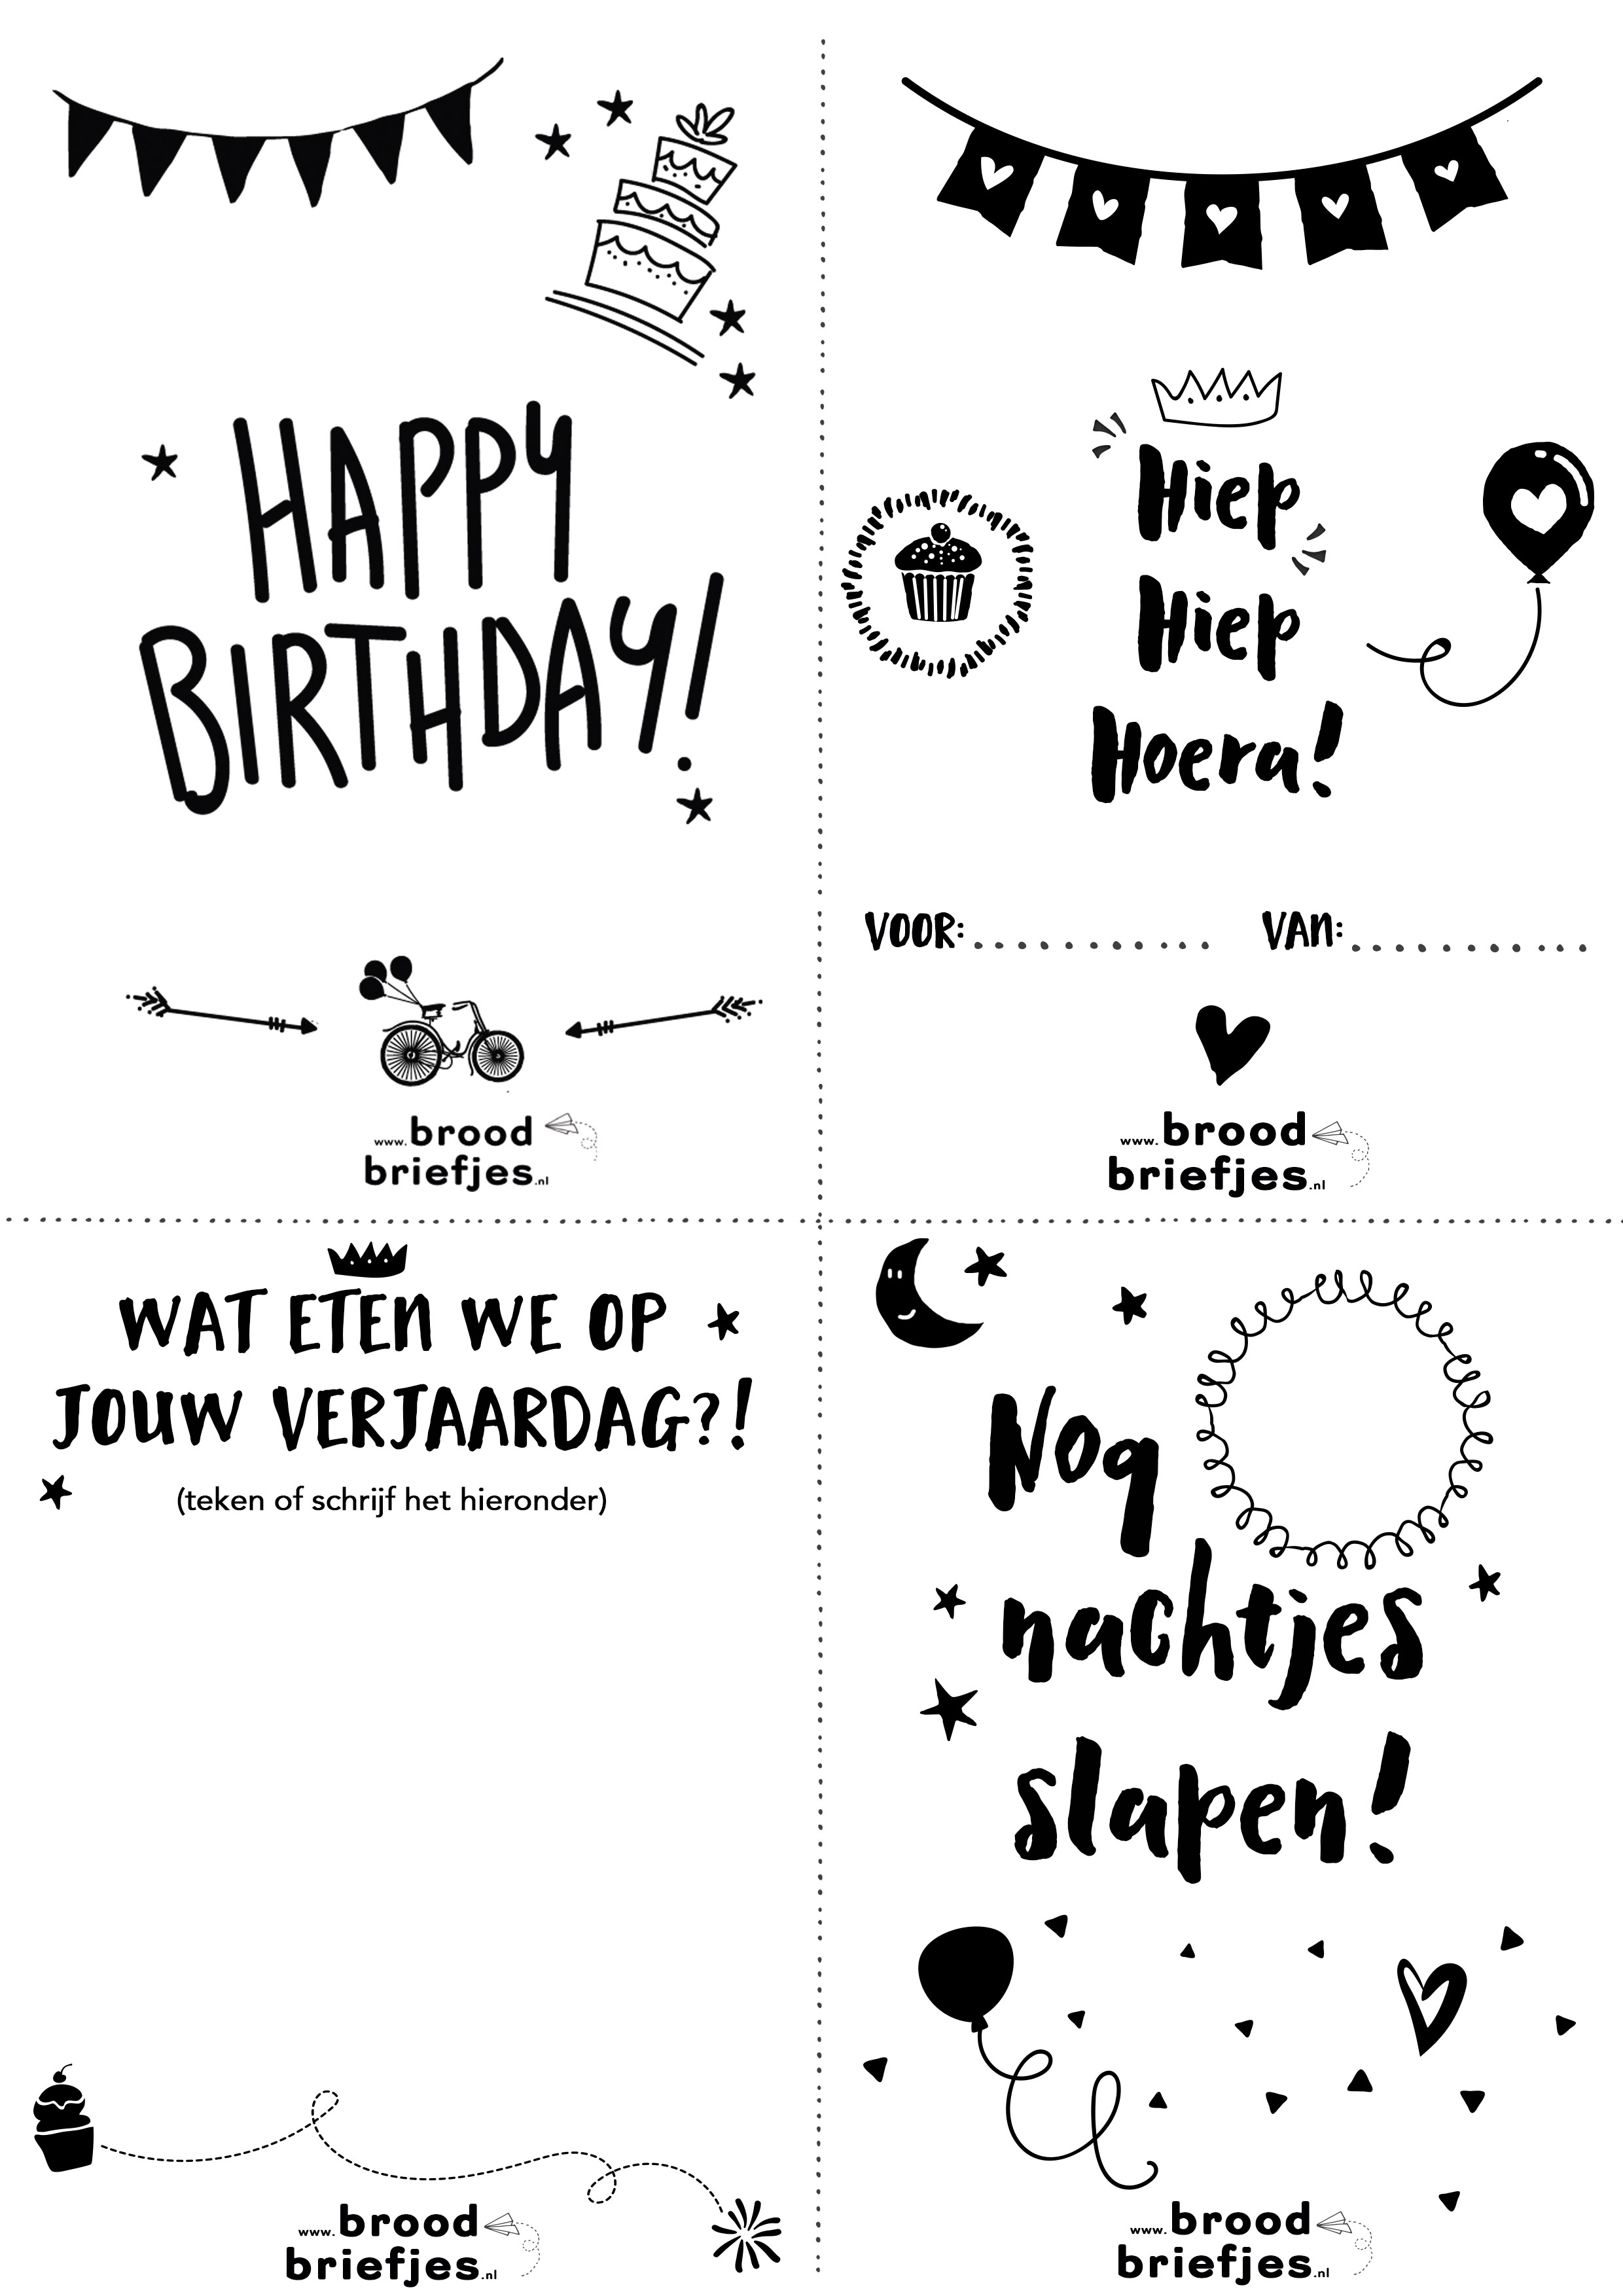 Verjaardag Brief | Inspectionconference